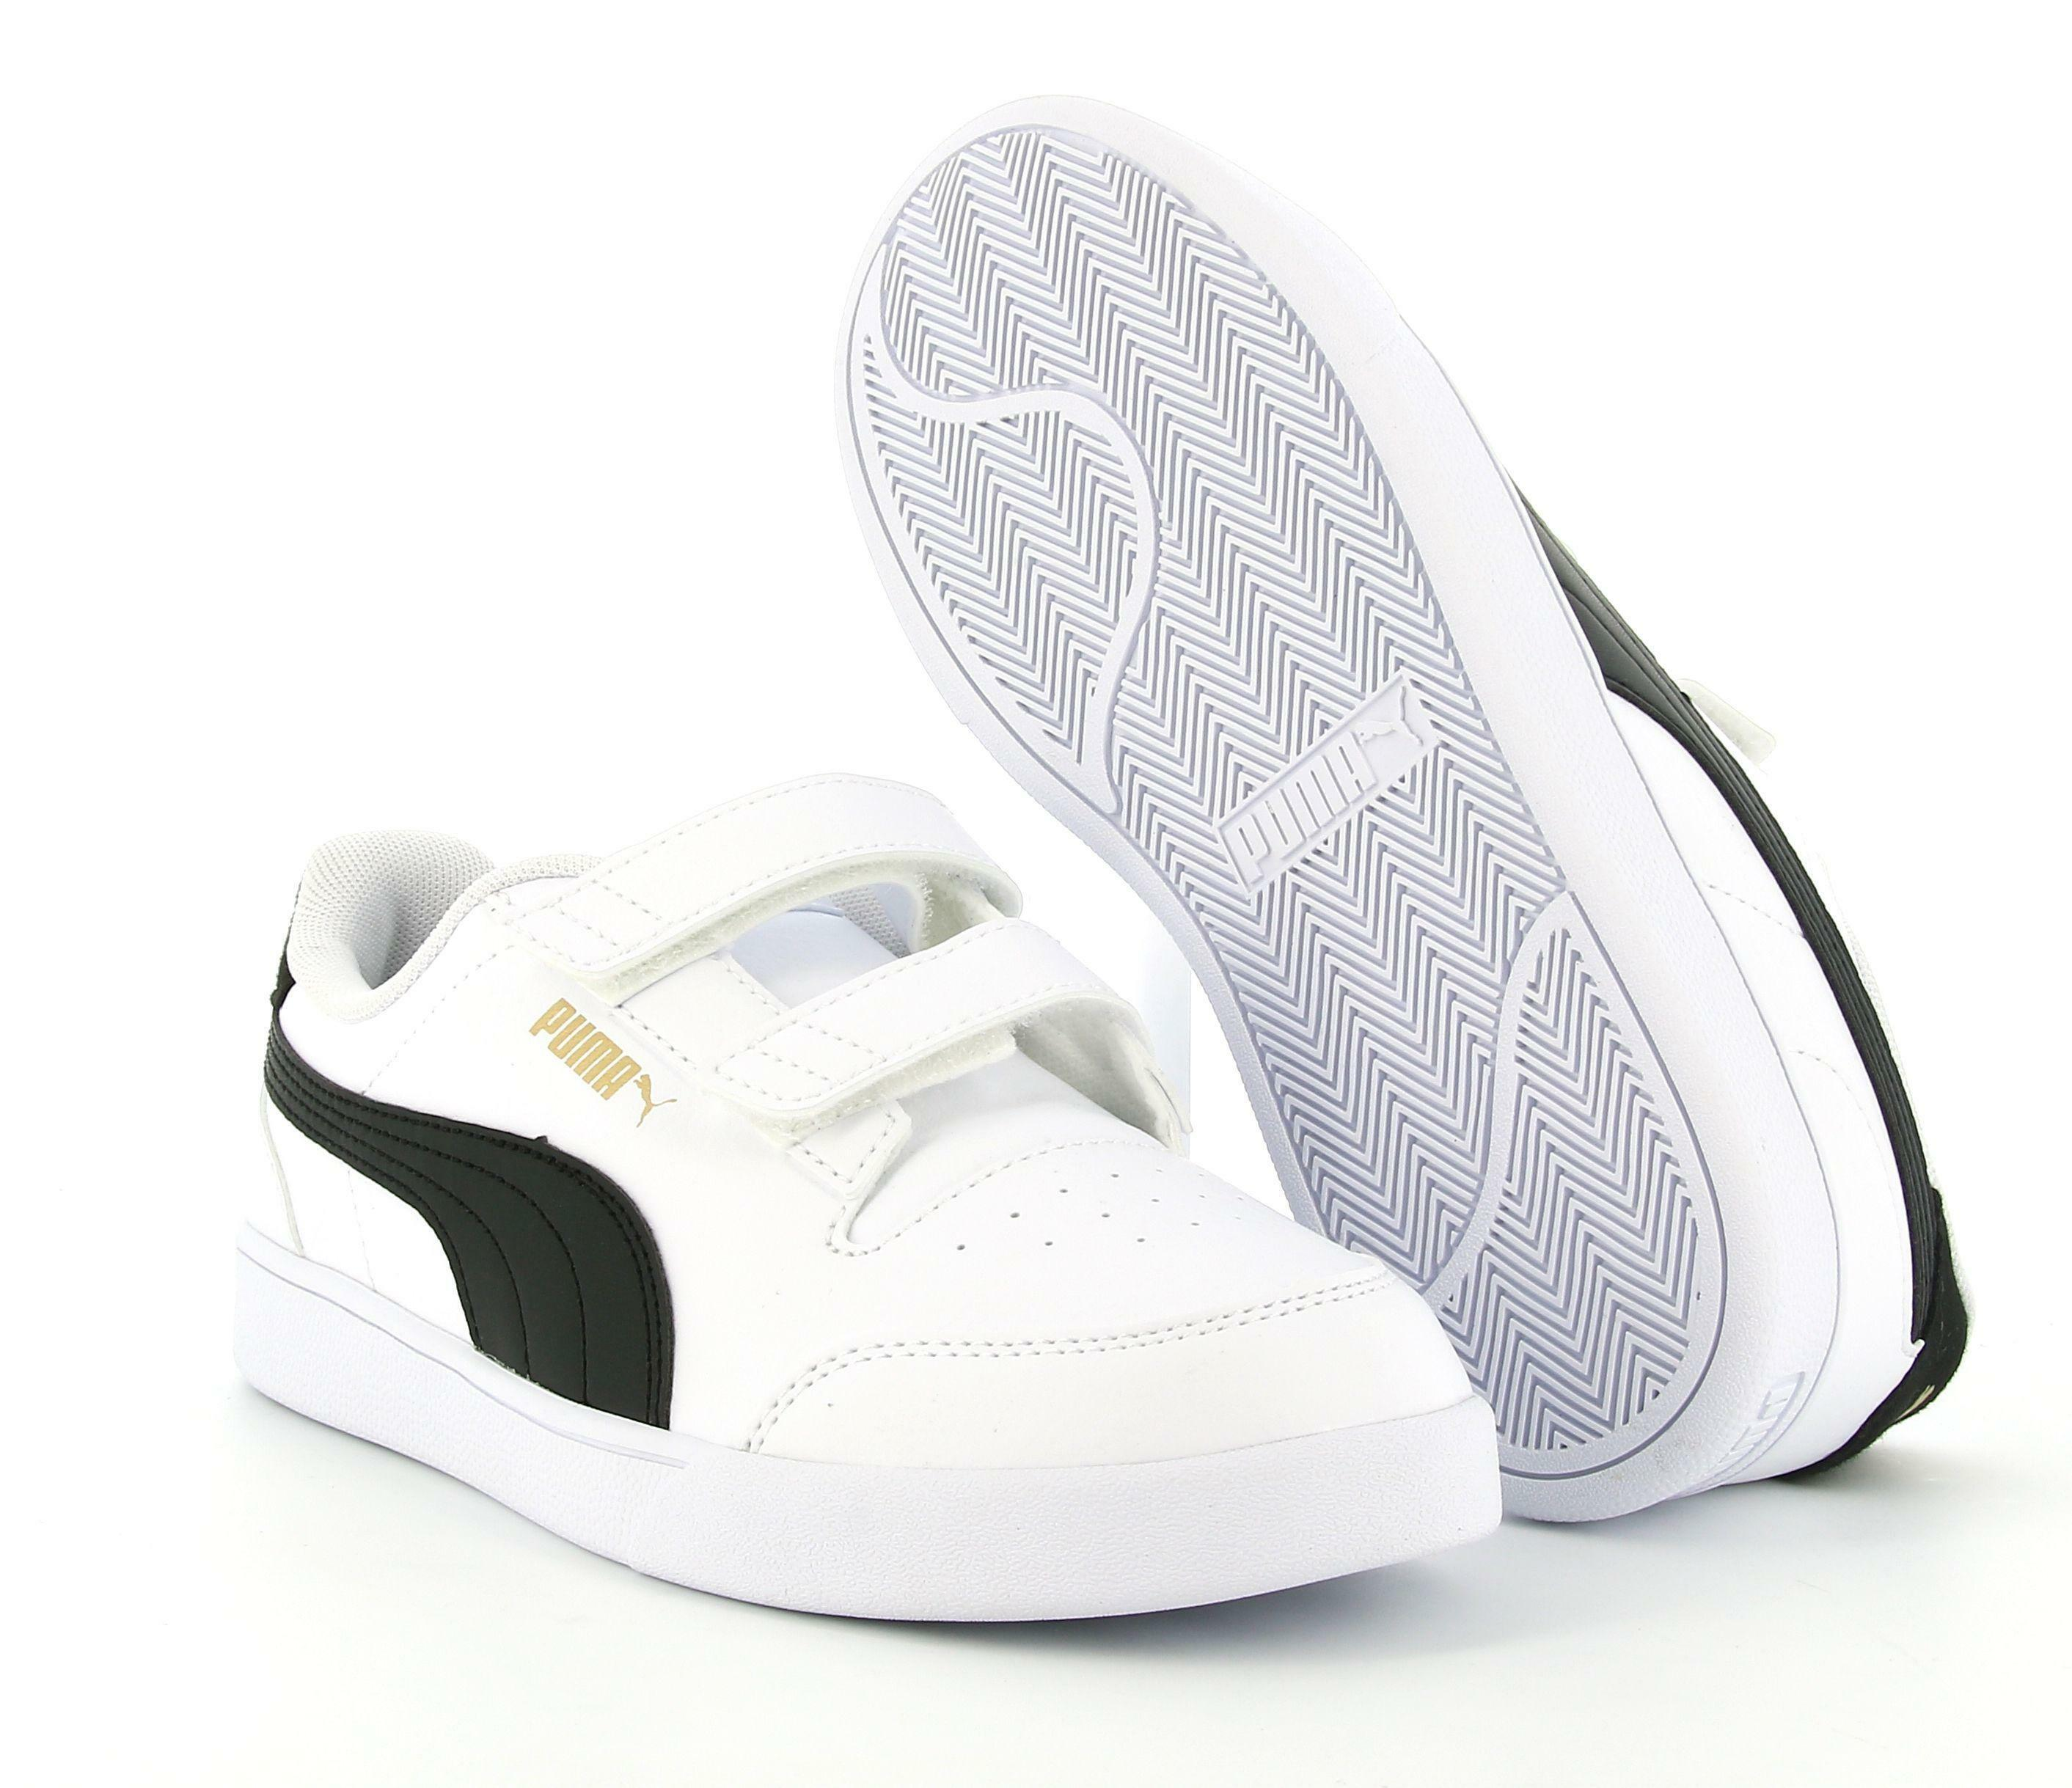 puma puma shuffle v ps 375689 002 sneaker bassa bambino bianca